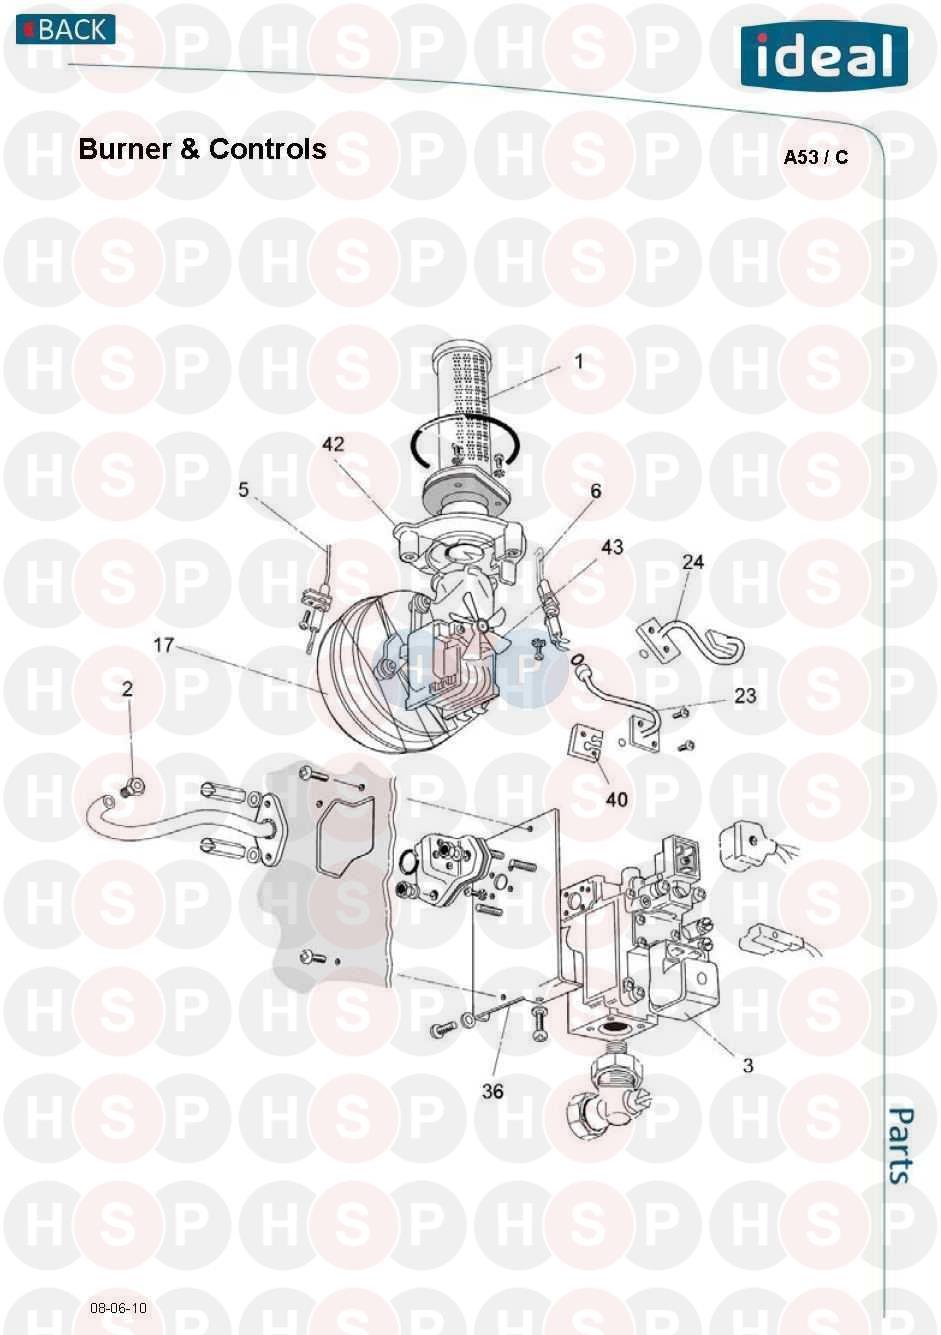 ideal minimiser 30ff  burner  u0026 controls  diagram